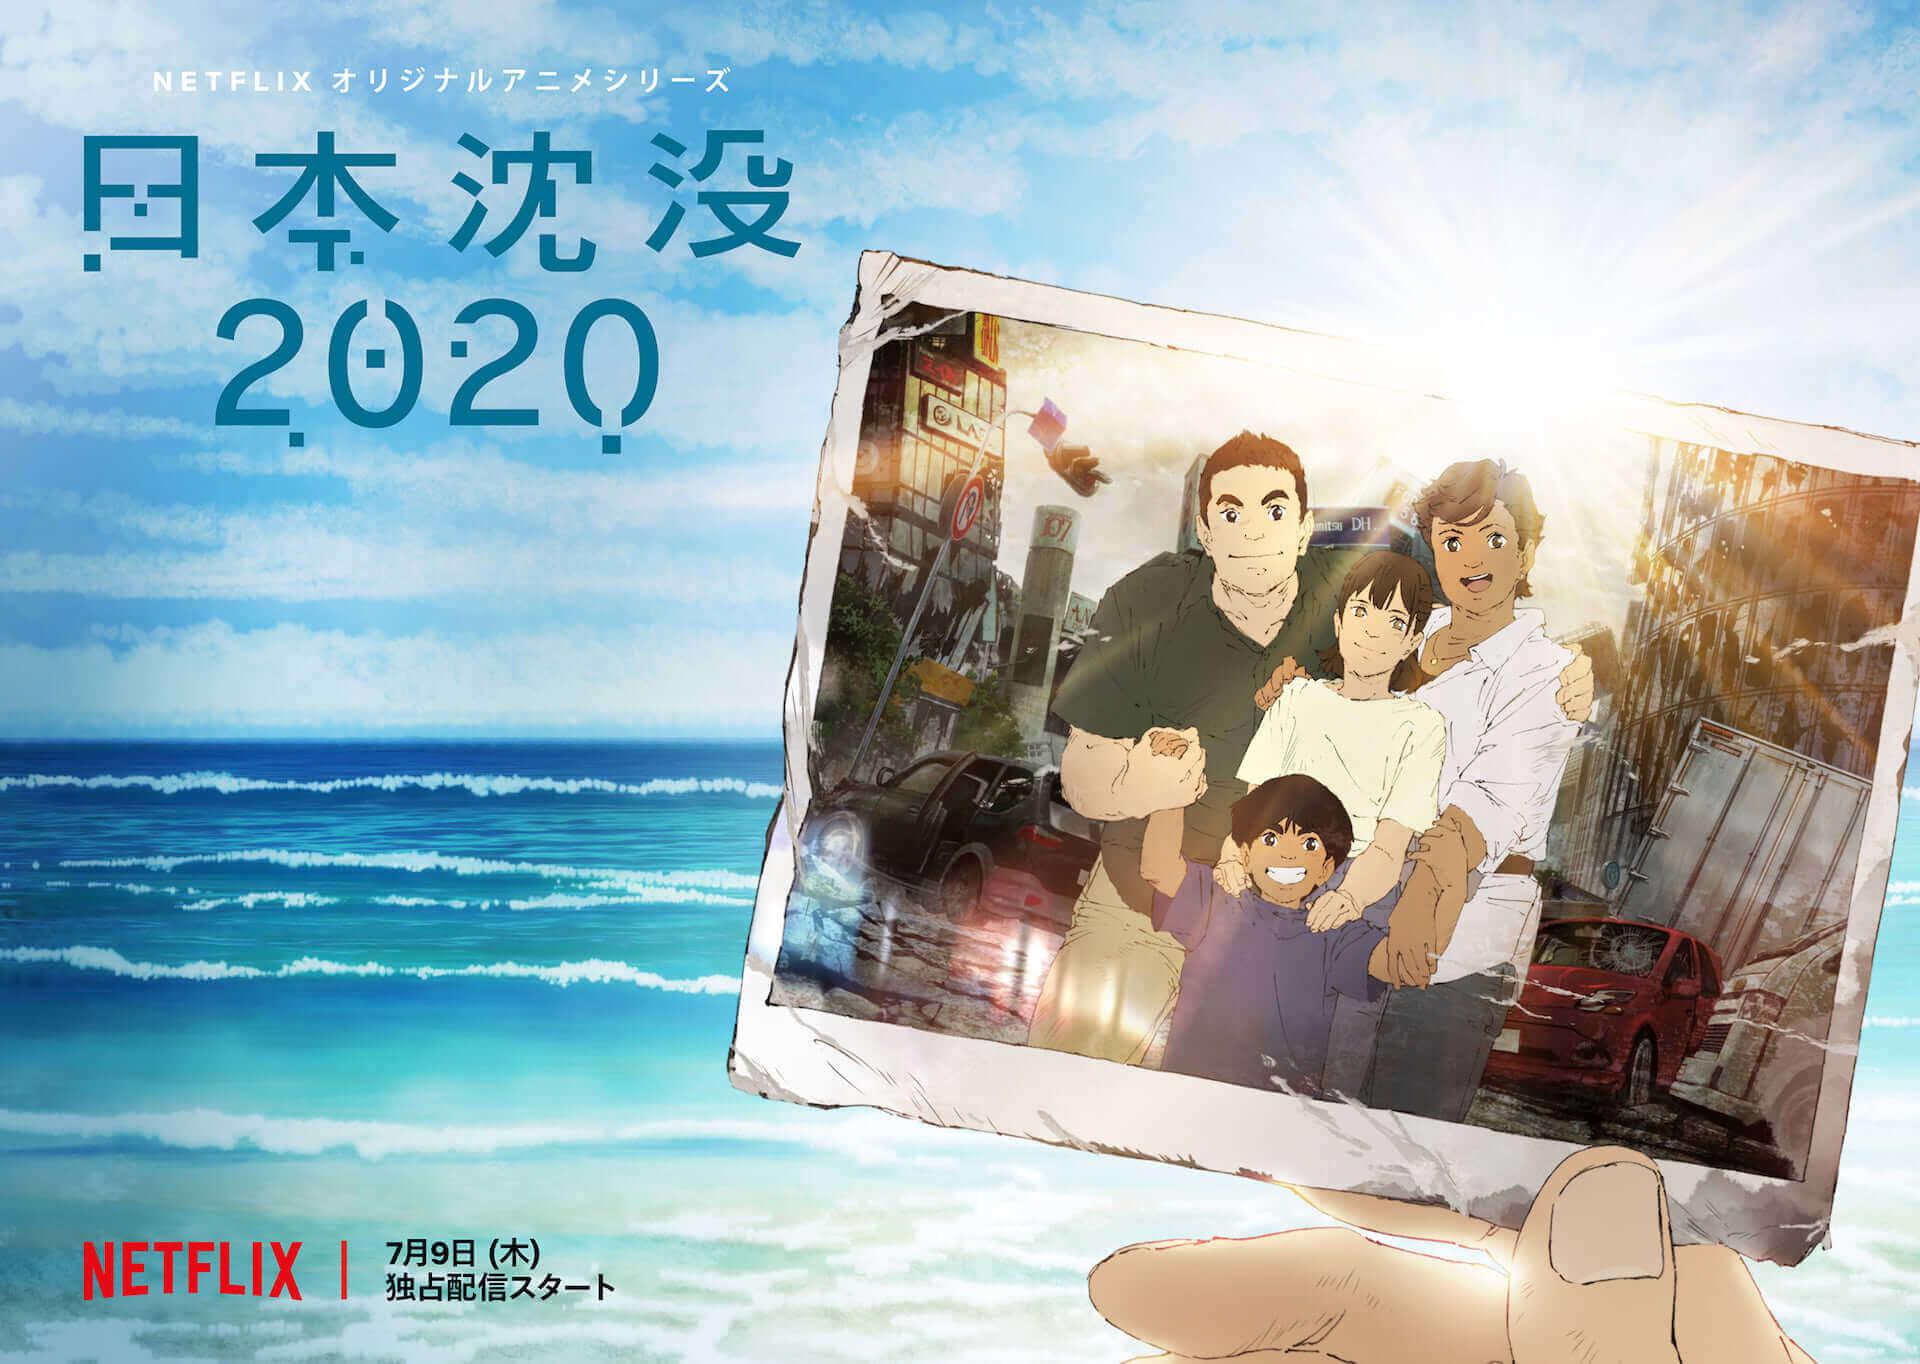 Netflix『日本沈没2020』のラップシーンをKEN THE 390が監修決定!小野賢章演じるカイト登場の本編映像も初解禁 art200707_japansinks_kenthe390_8-1920x1364